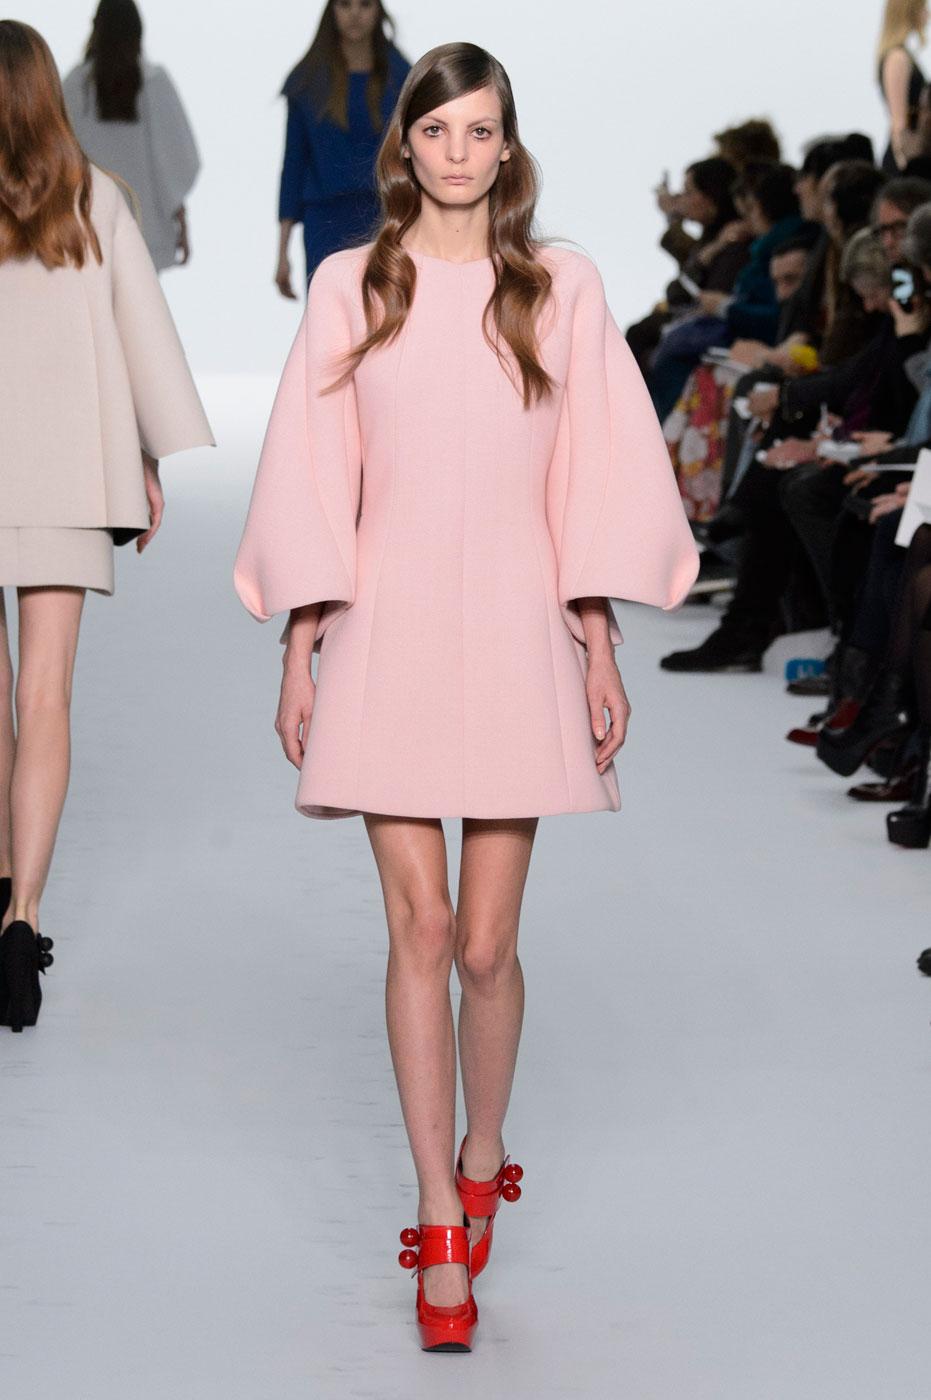 Kayek-fashion-runway-show-haute-couture-paris-spring-summer-2015-the-impression-21